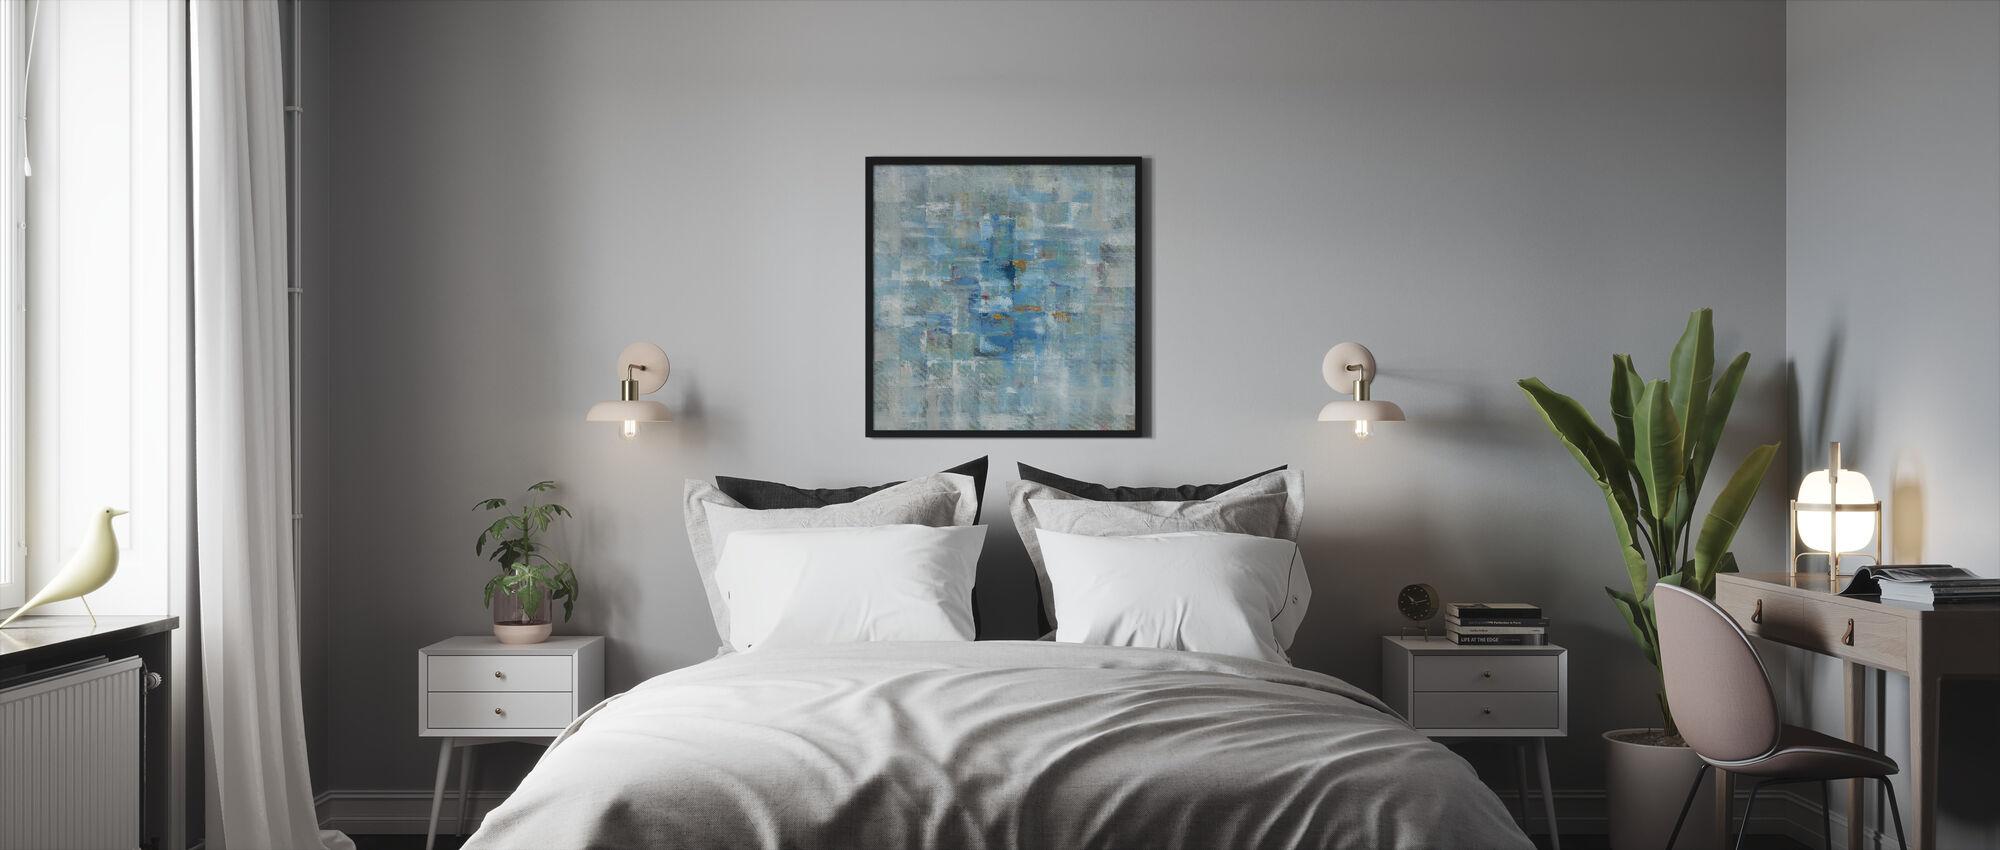 Abstrakte firkanter - Innrammet bilde - Soverom